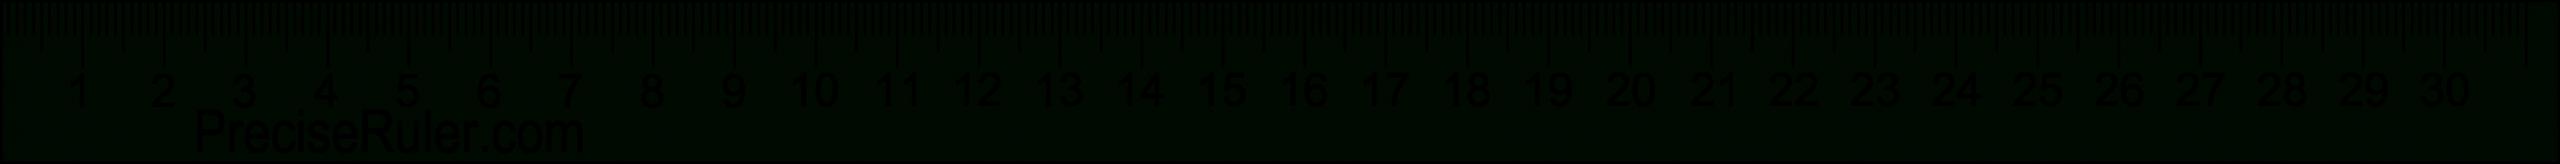 Ruler Clipart 20 Cm, Ruler 20 Cm Transparent Free For